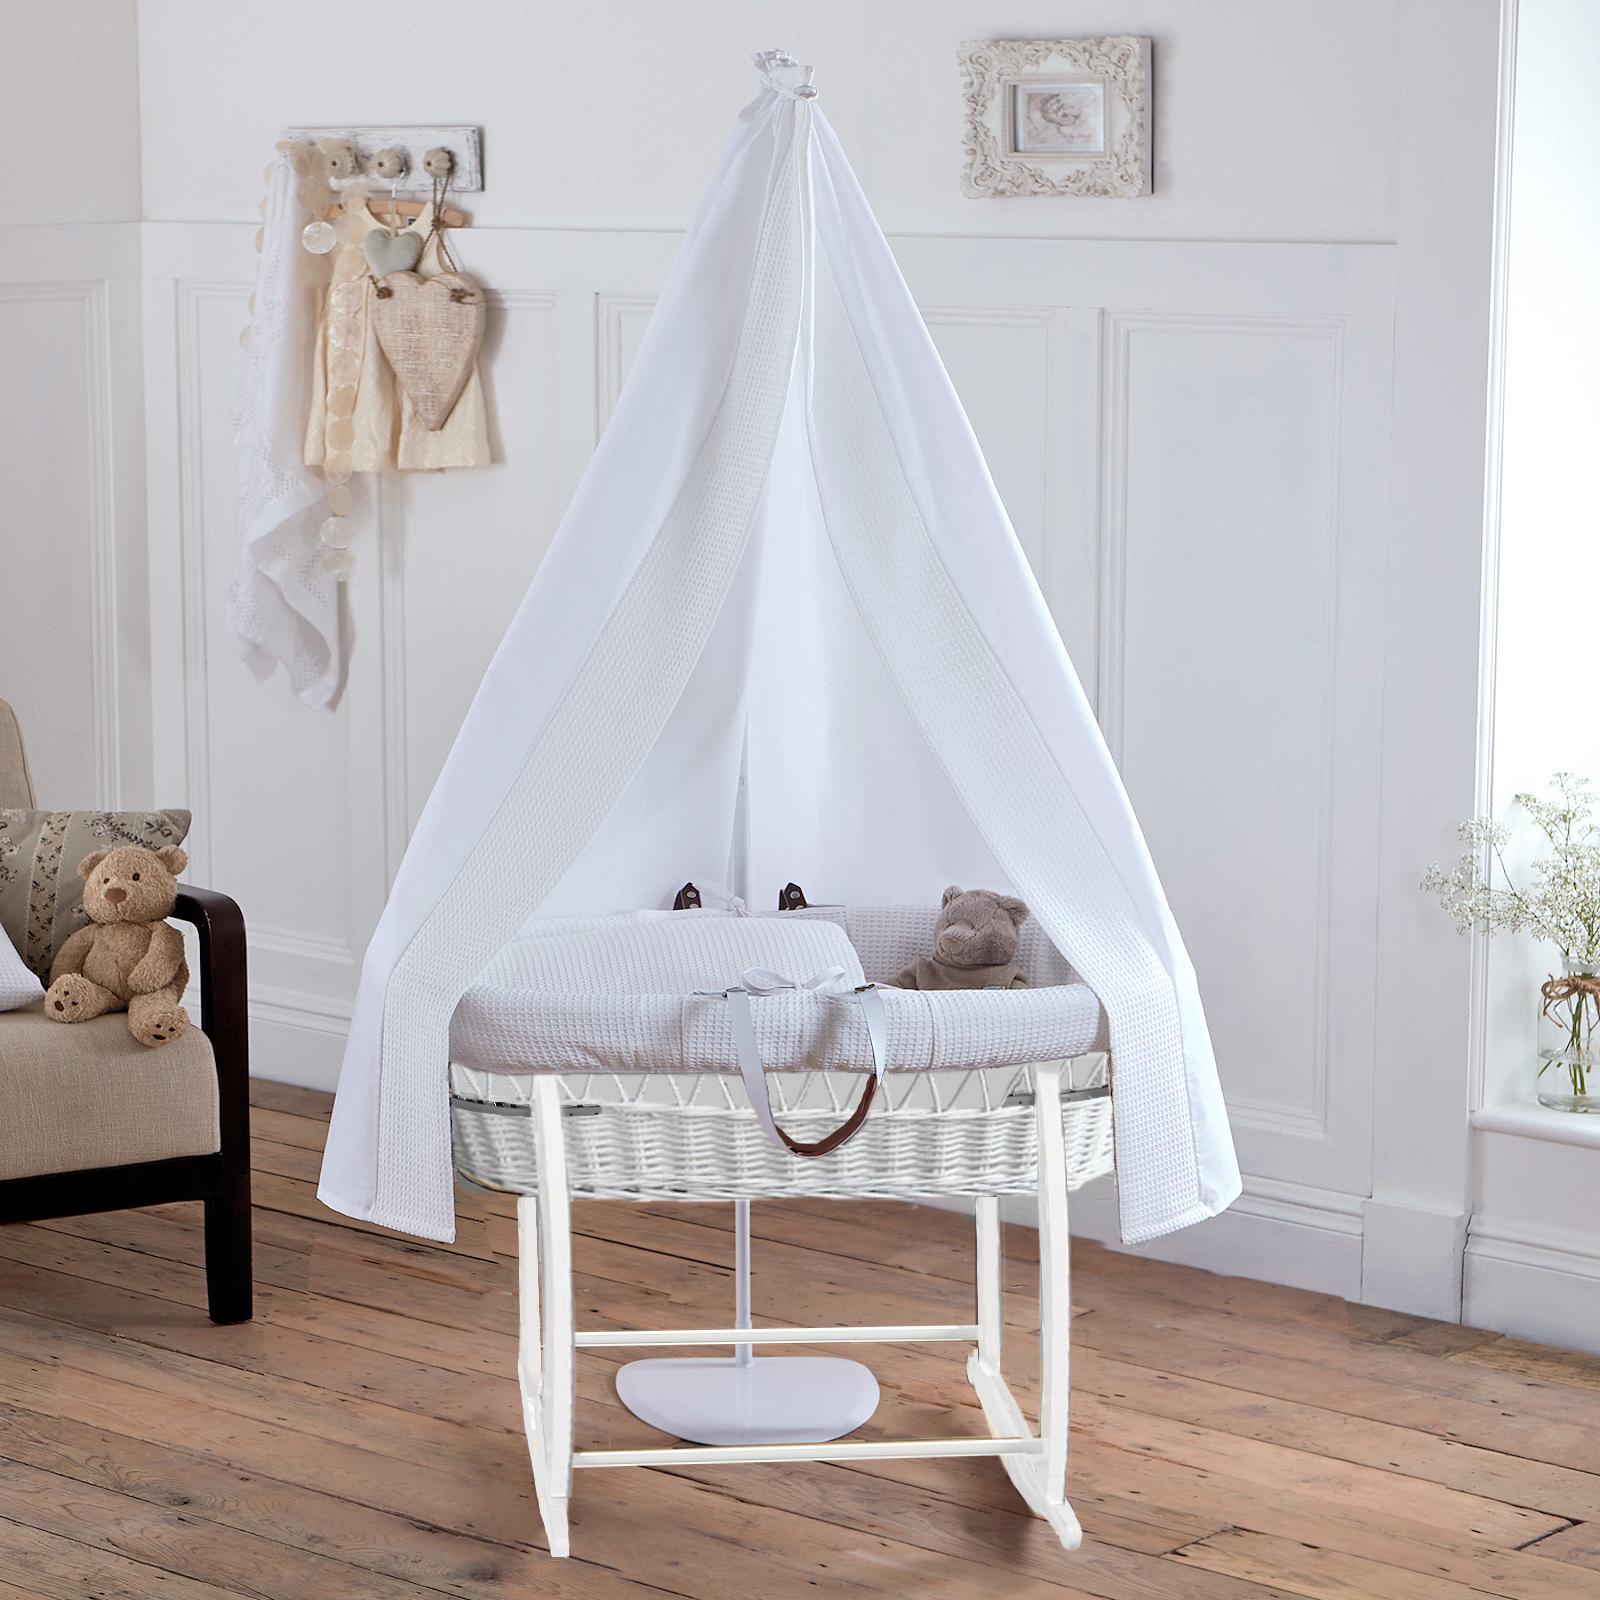 clair de lune 6 piece white wicker moses basket stand. Black Bedroom Furniture Sets. Home Design Ideas